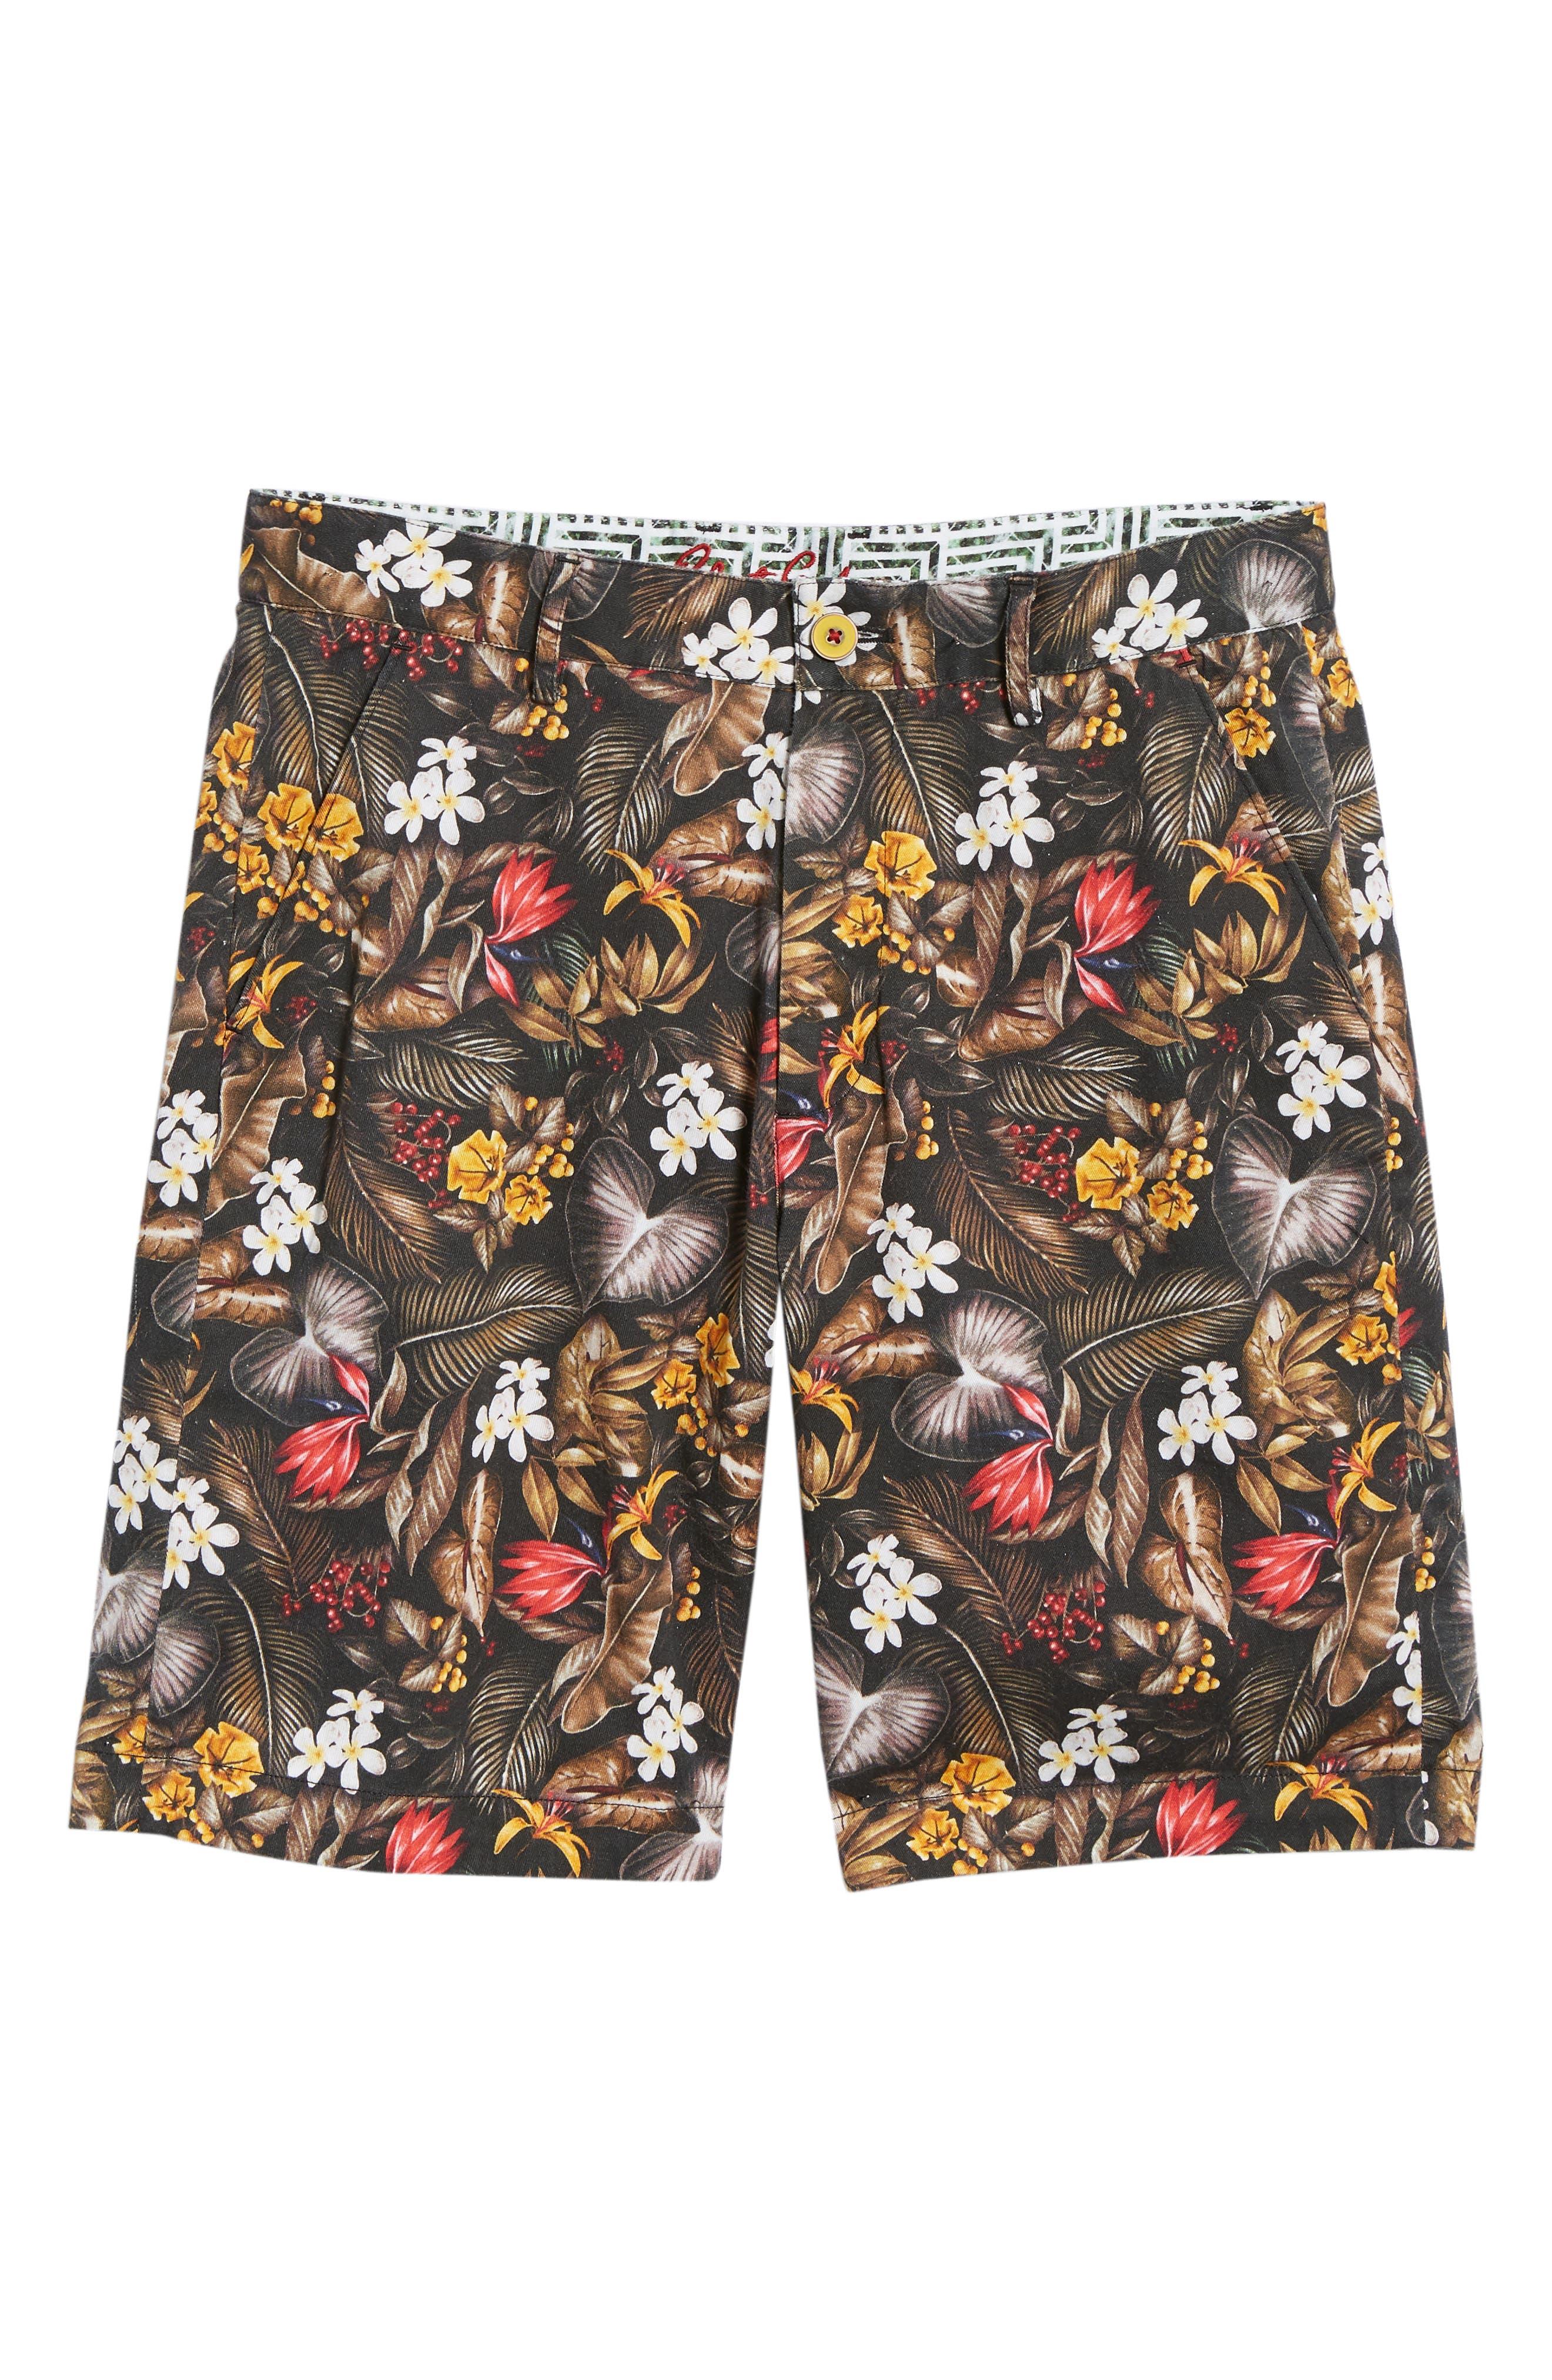 Maracas Woven Shorts,                             Alternate thumbnail 5, color,                             Multi